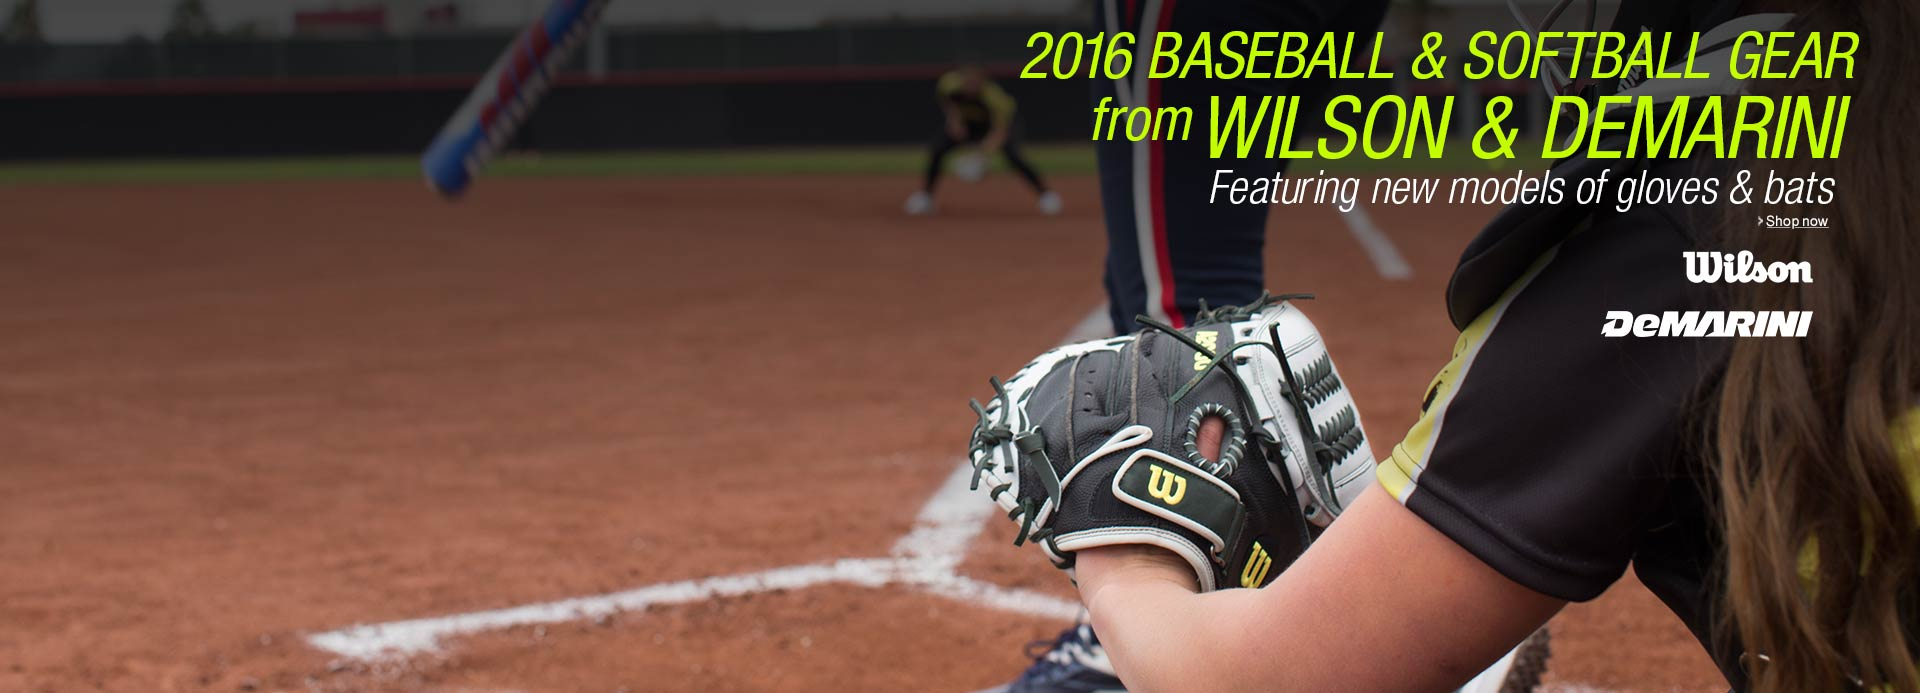 Wilson & DeMarini 2016 Baseball